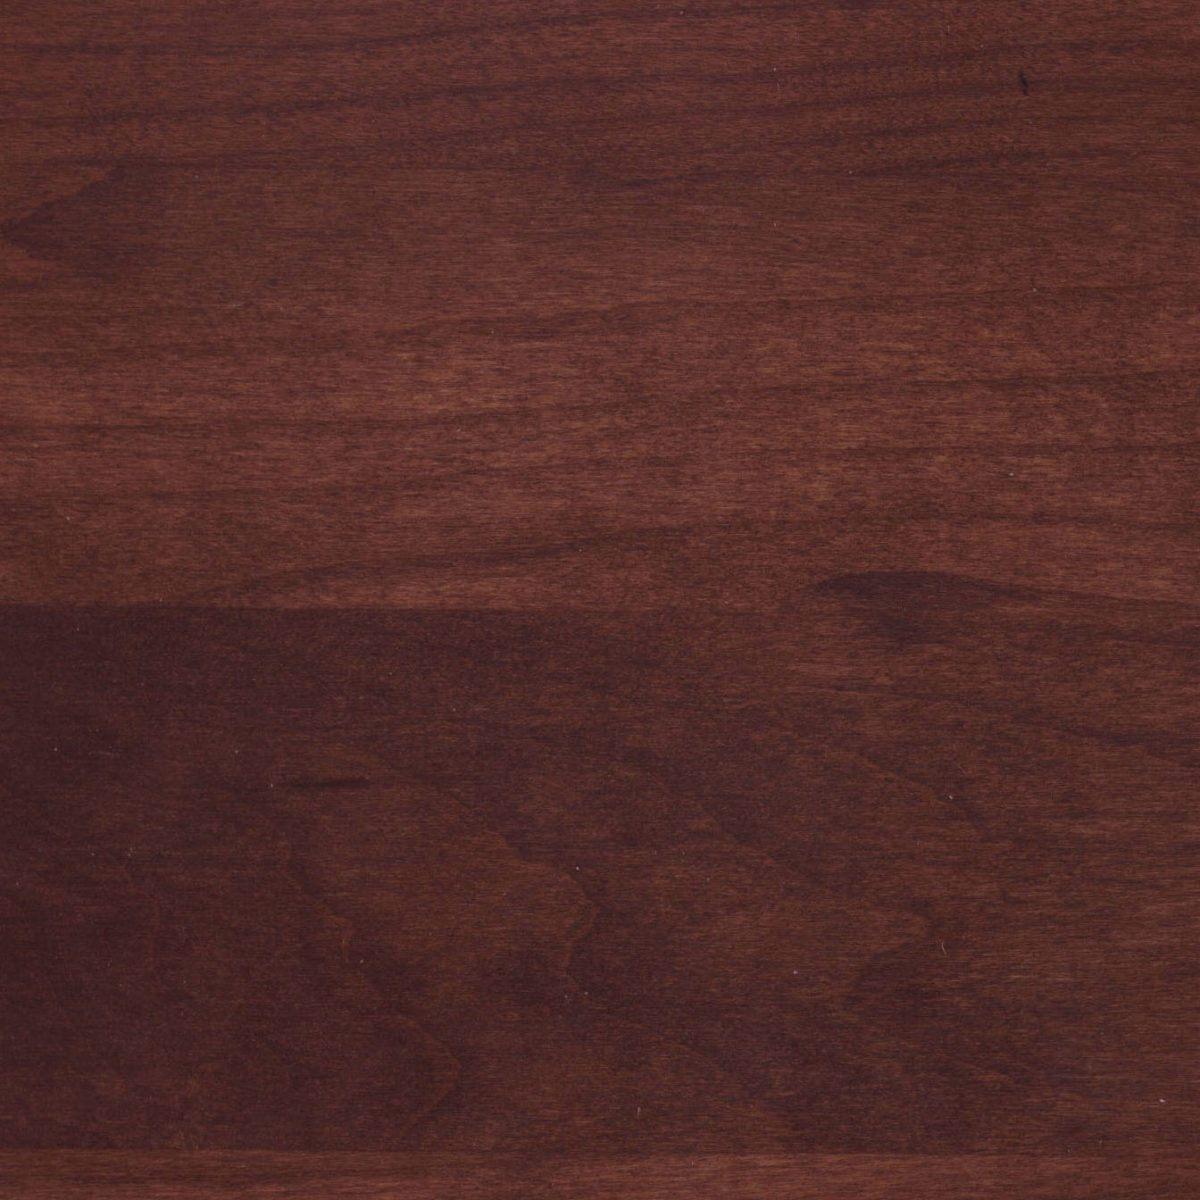 37A Cherry Wood Sample